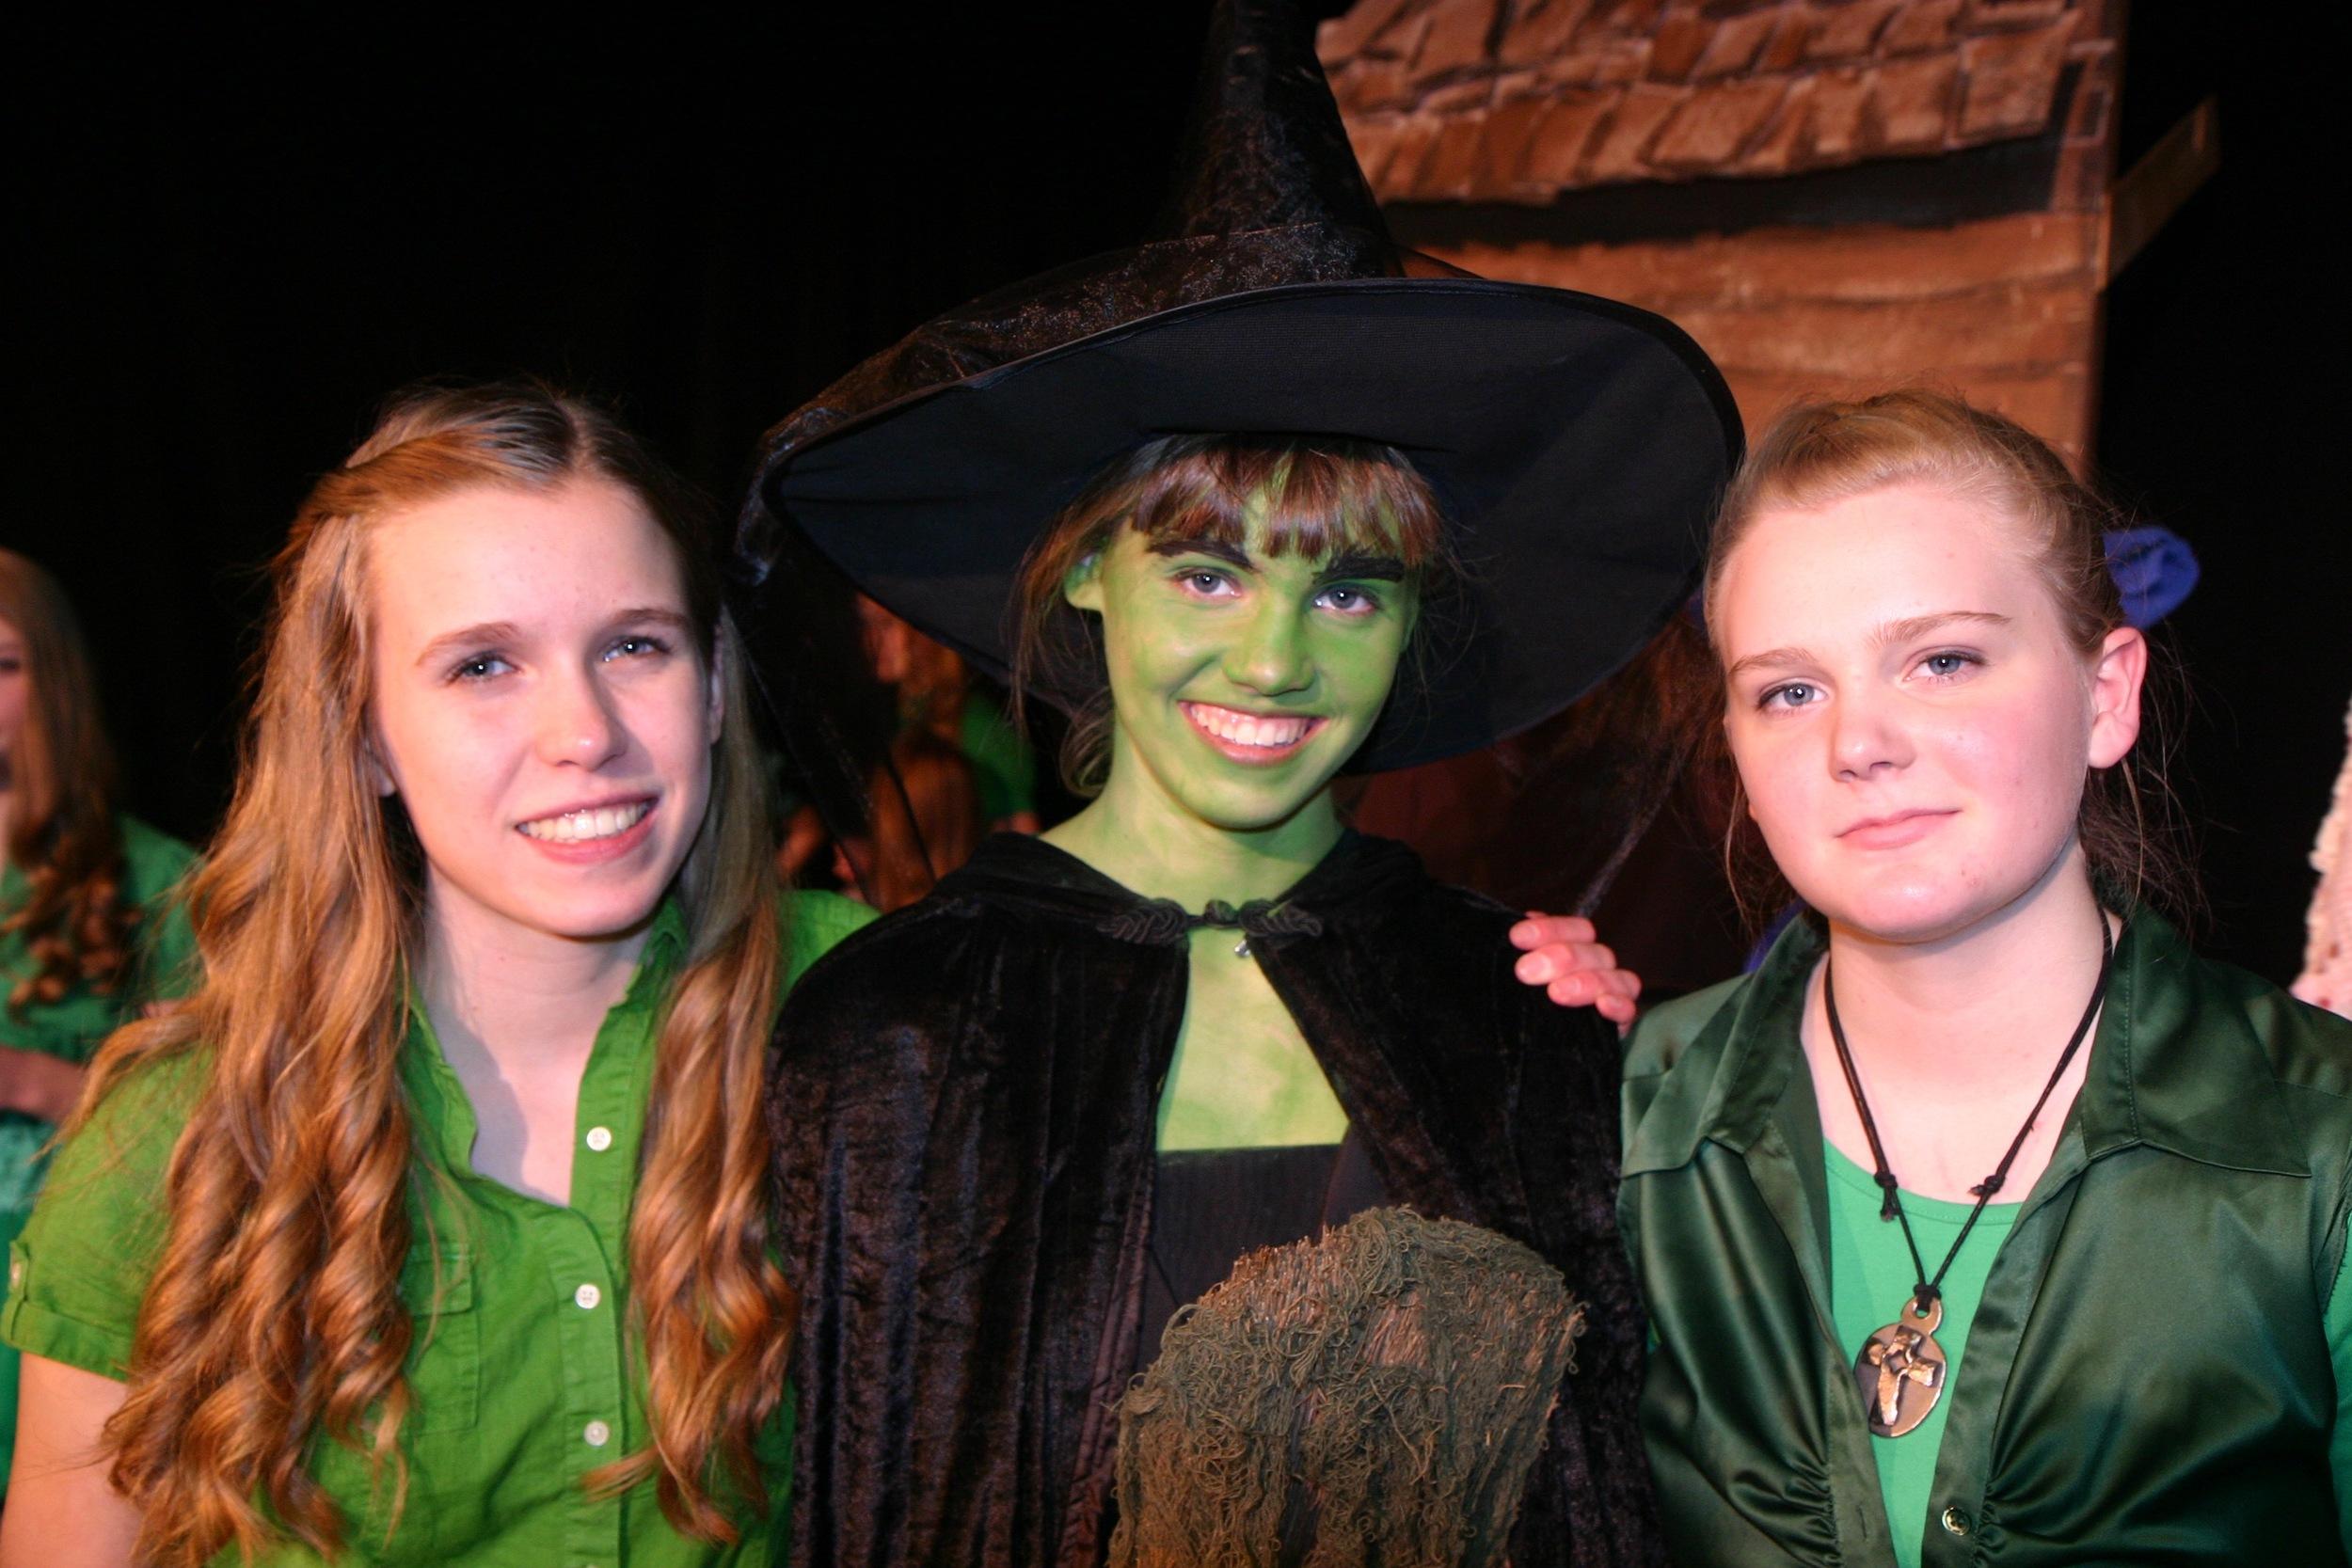 Janelle Ikes, Elaine George, and Erica Block